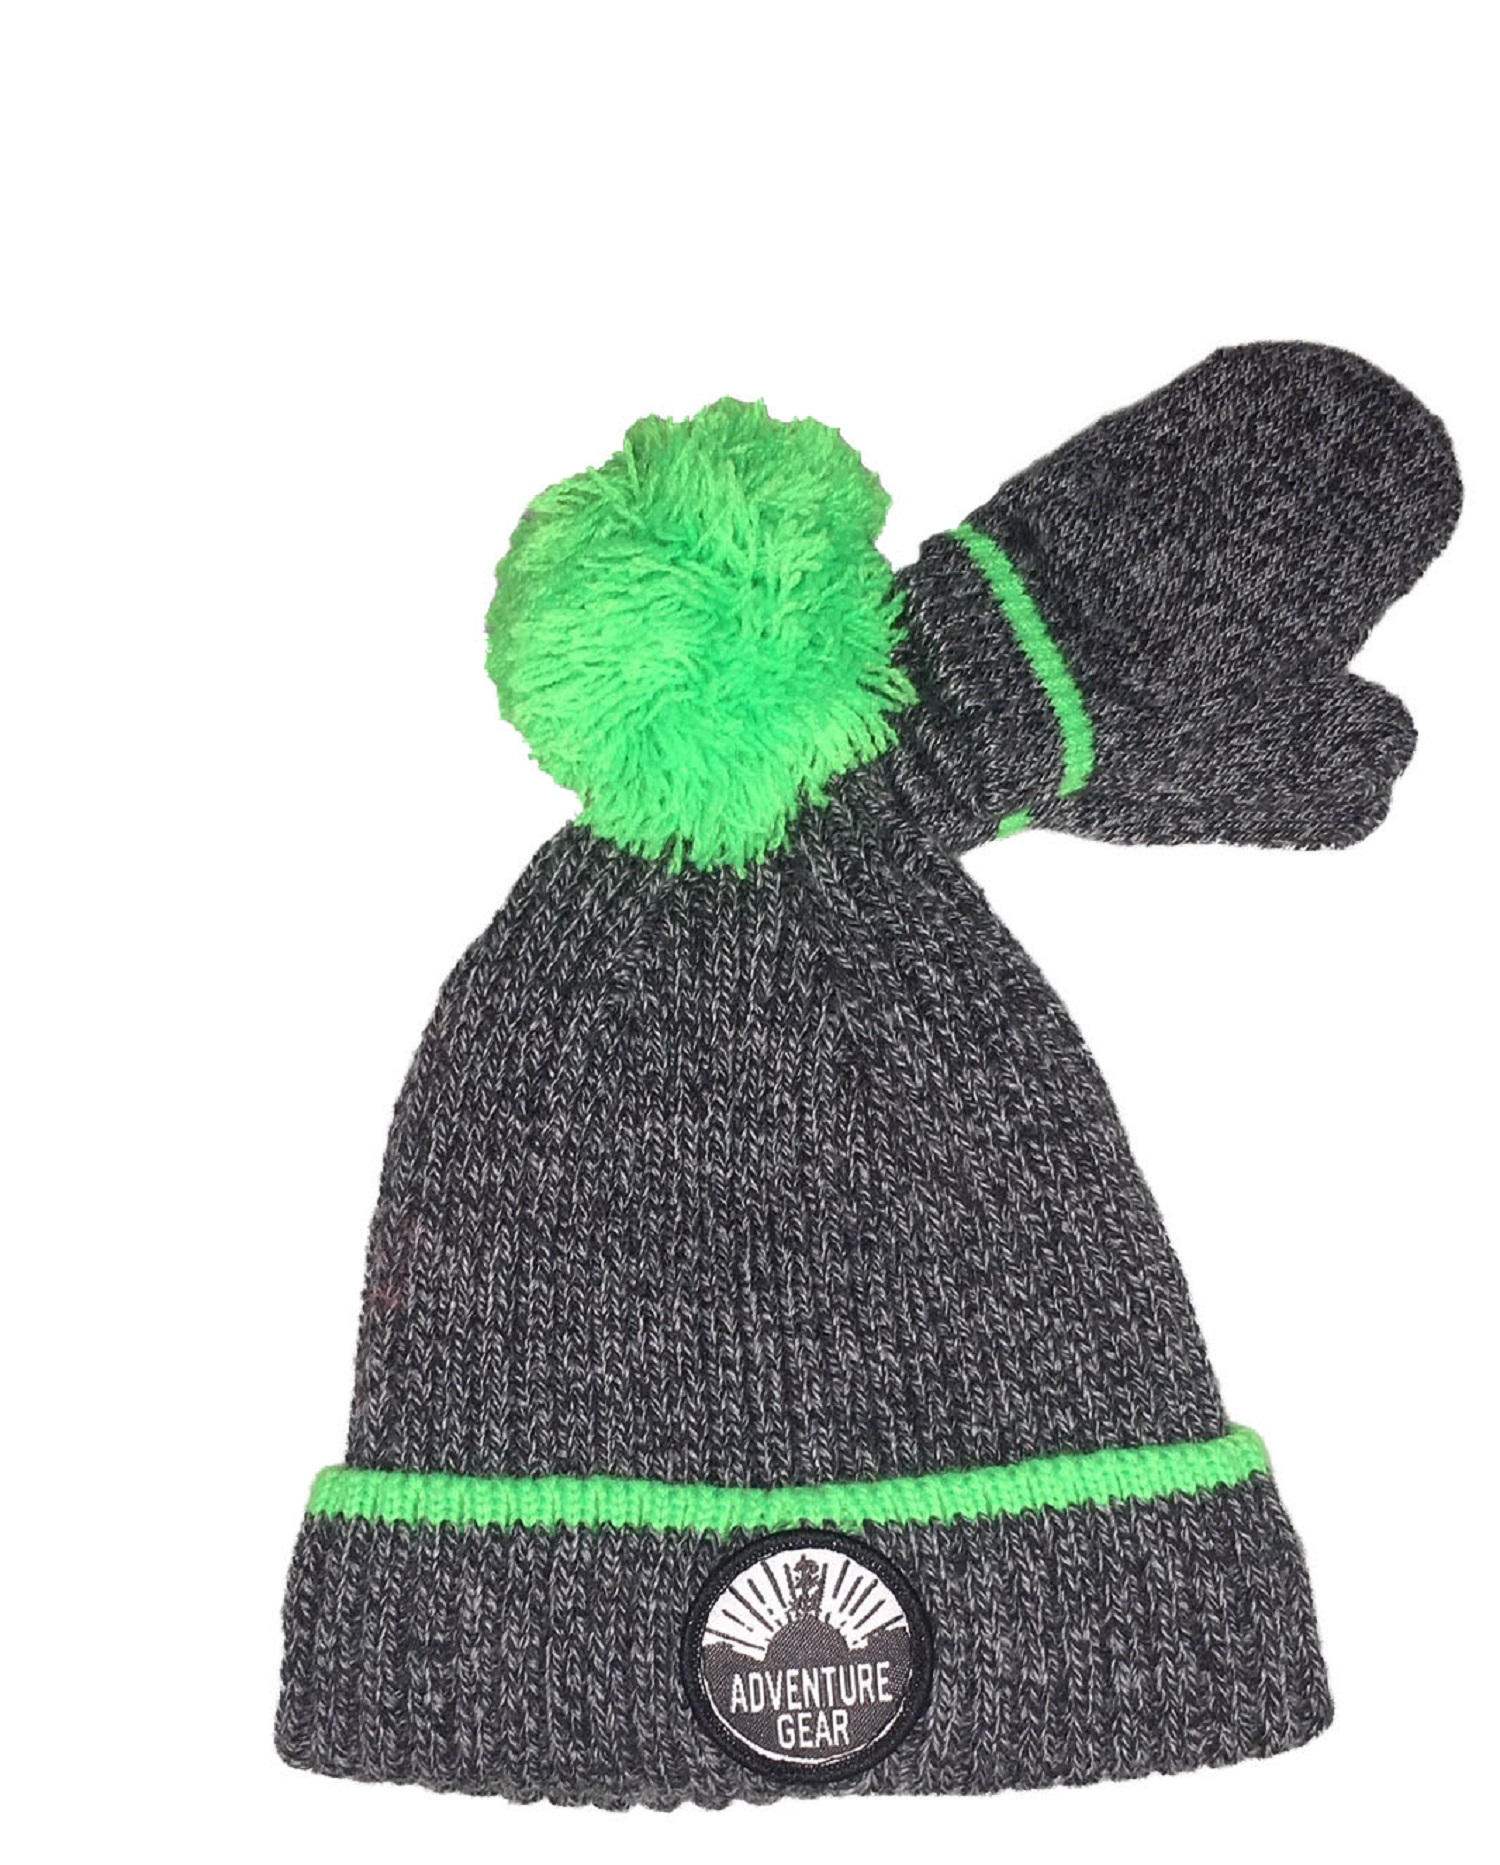 6e2b94fb6 Details about Carter's Baby Boys' Hat & Glove Set, 0-9 Months